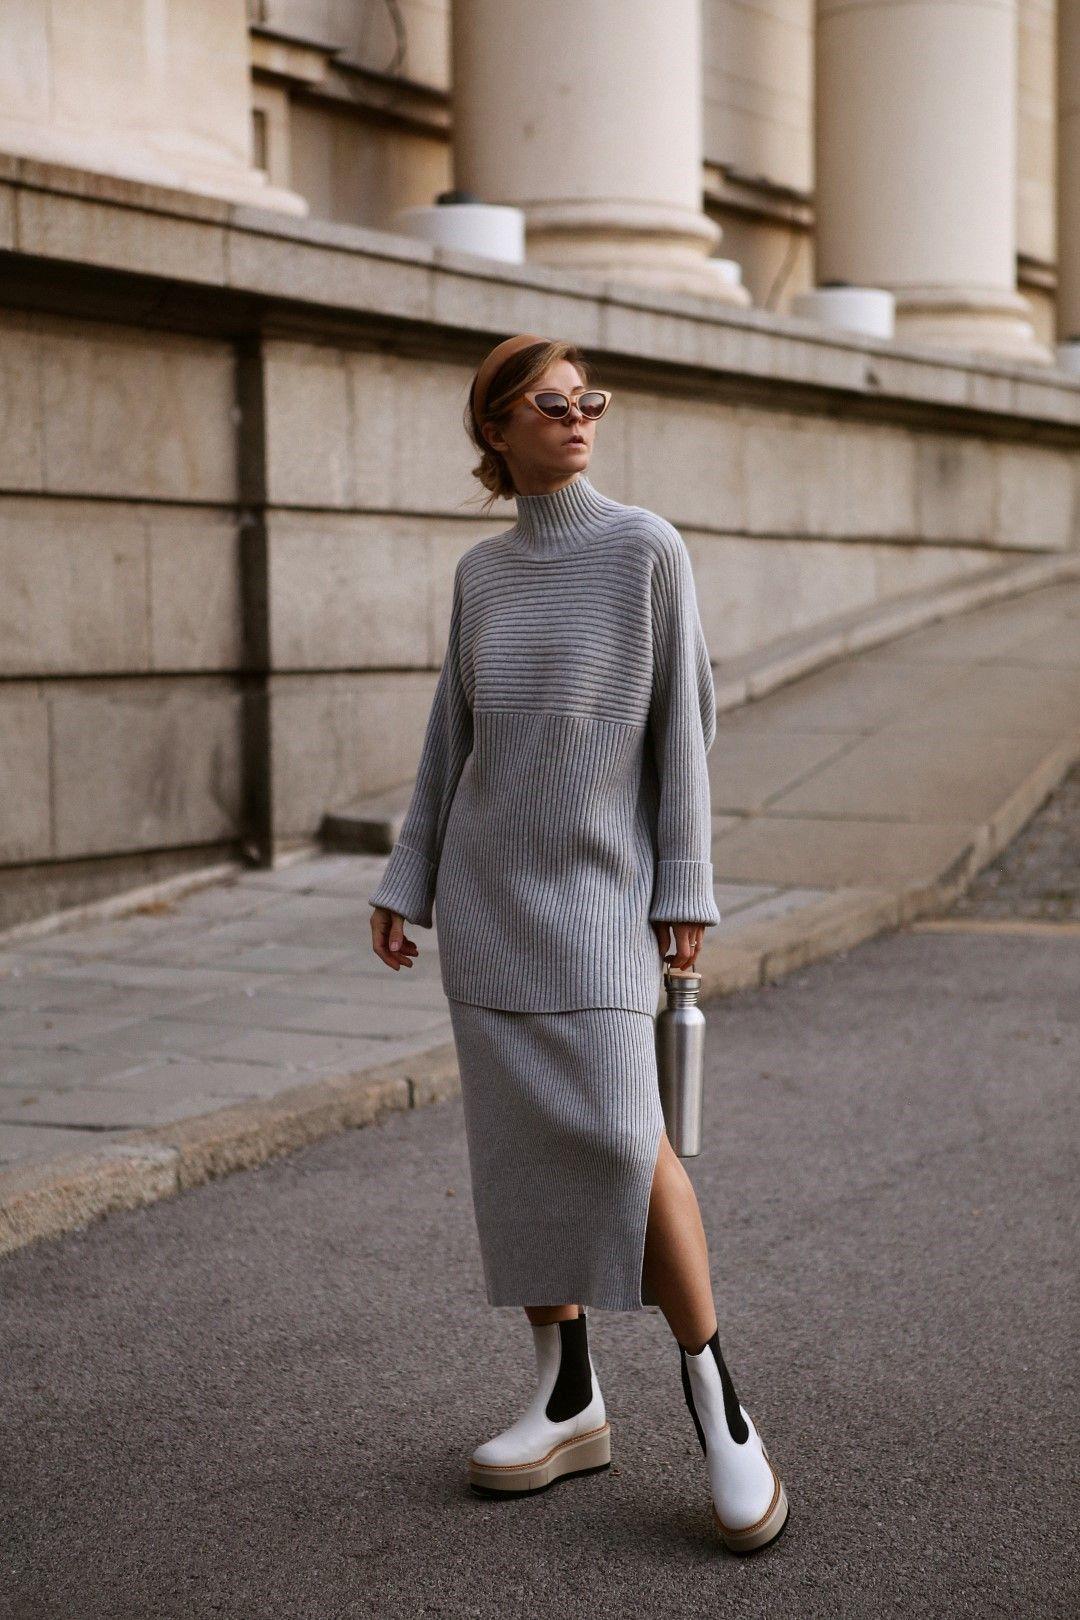 Палто Molly Bracken, рокля-пуловер BOSS, обувки Dr. Martens от магазини Collective.